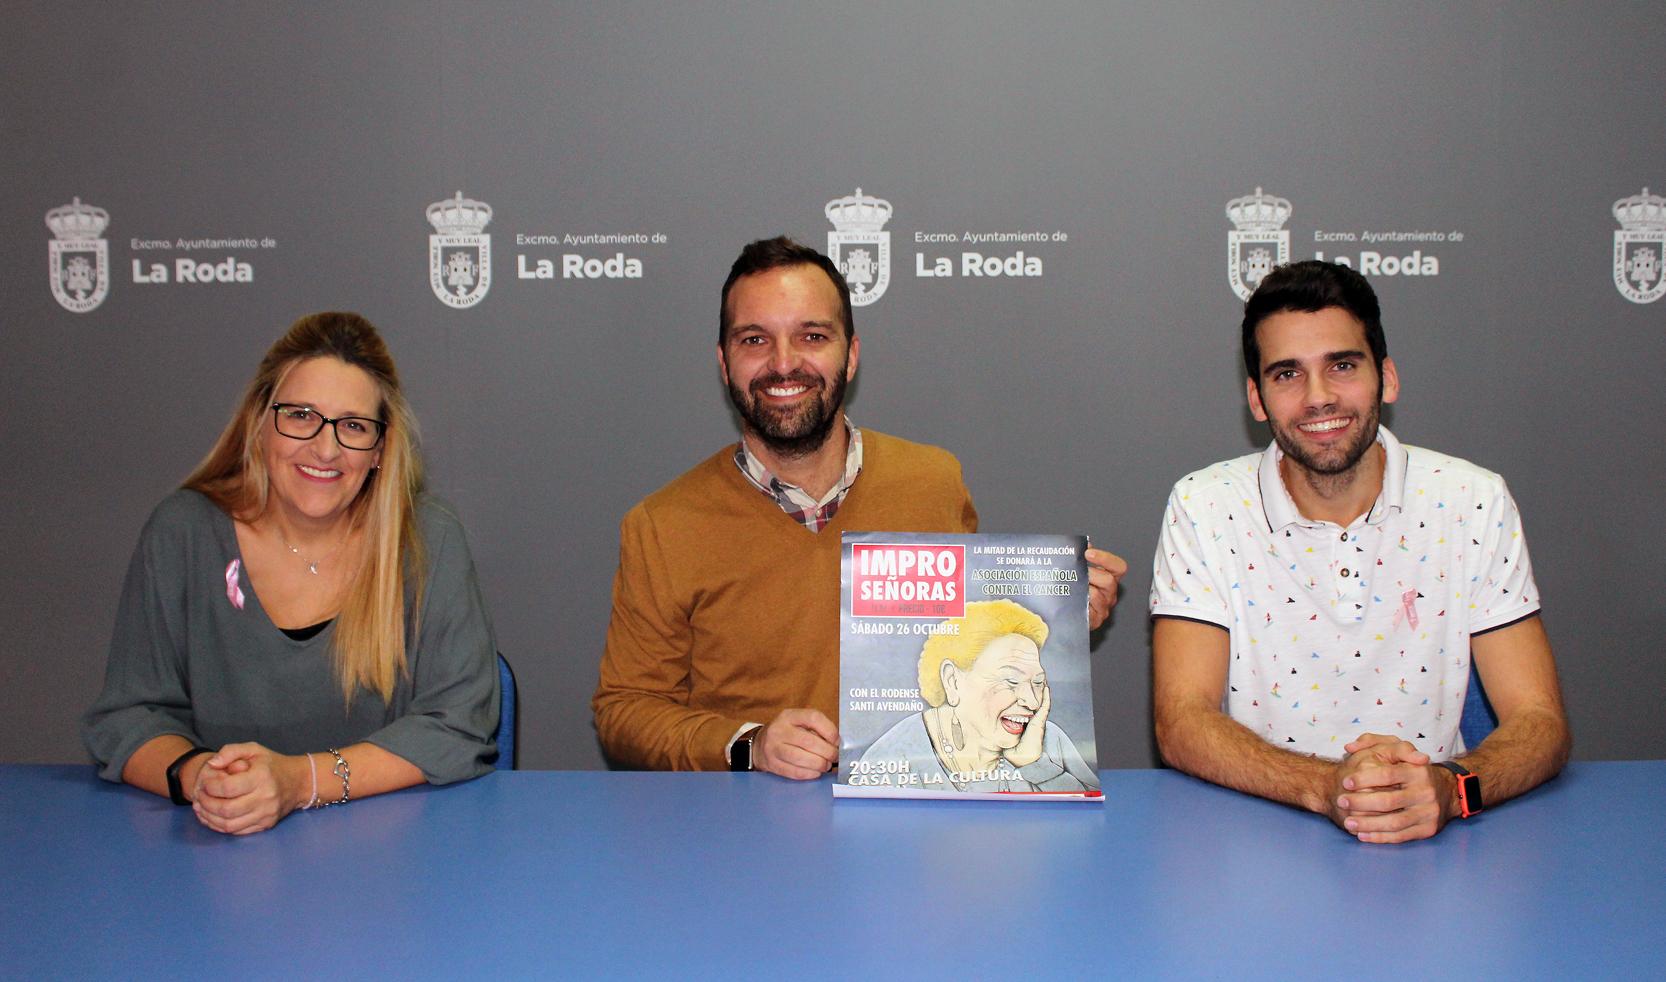 Impro Señoras, Risas Solidarias Con Santi Avendaño